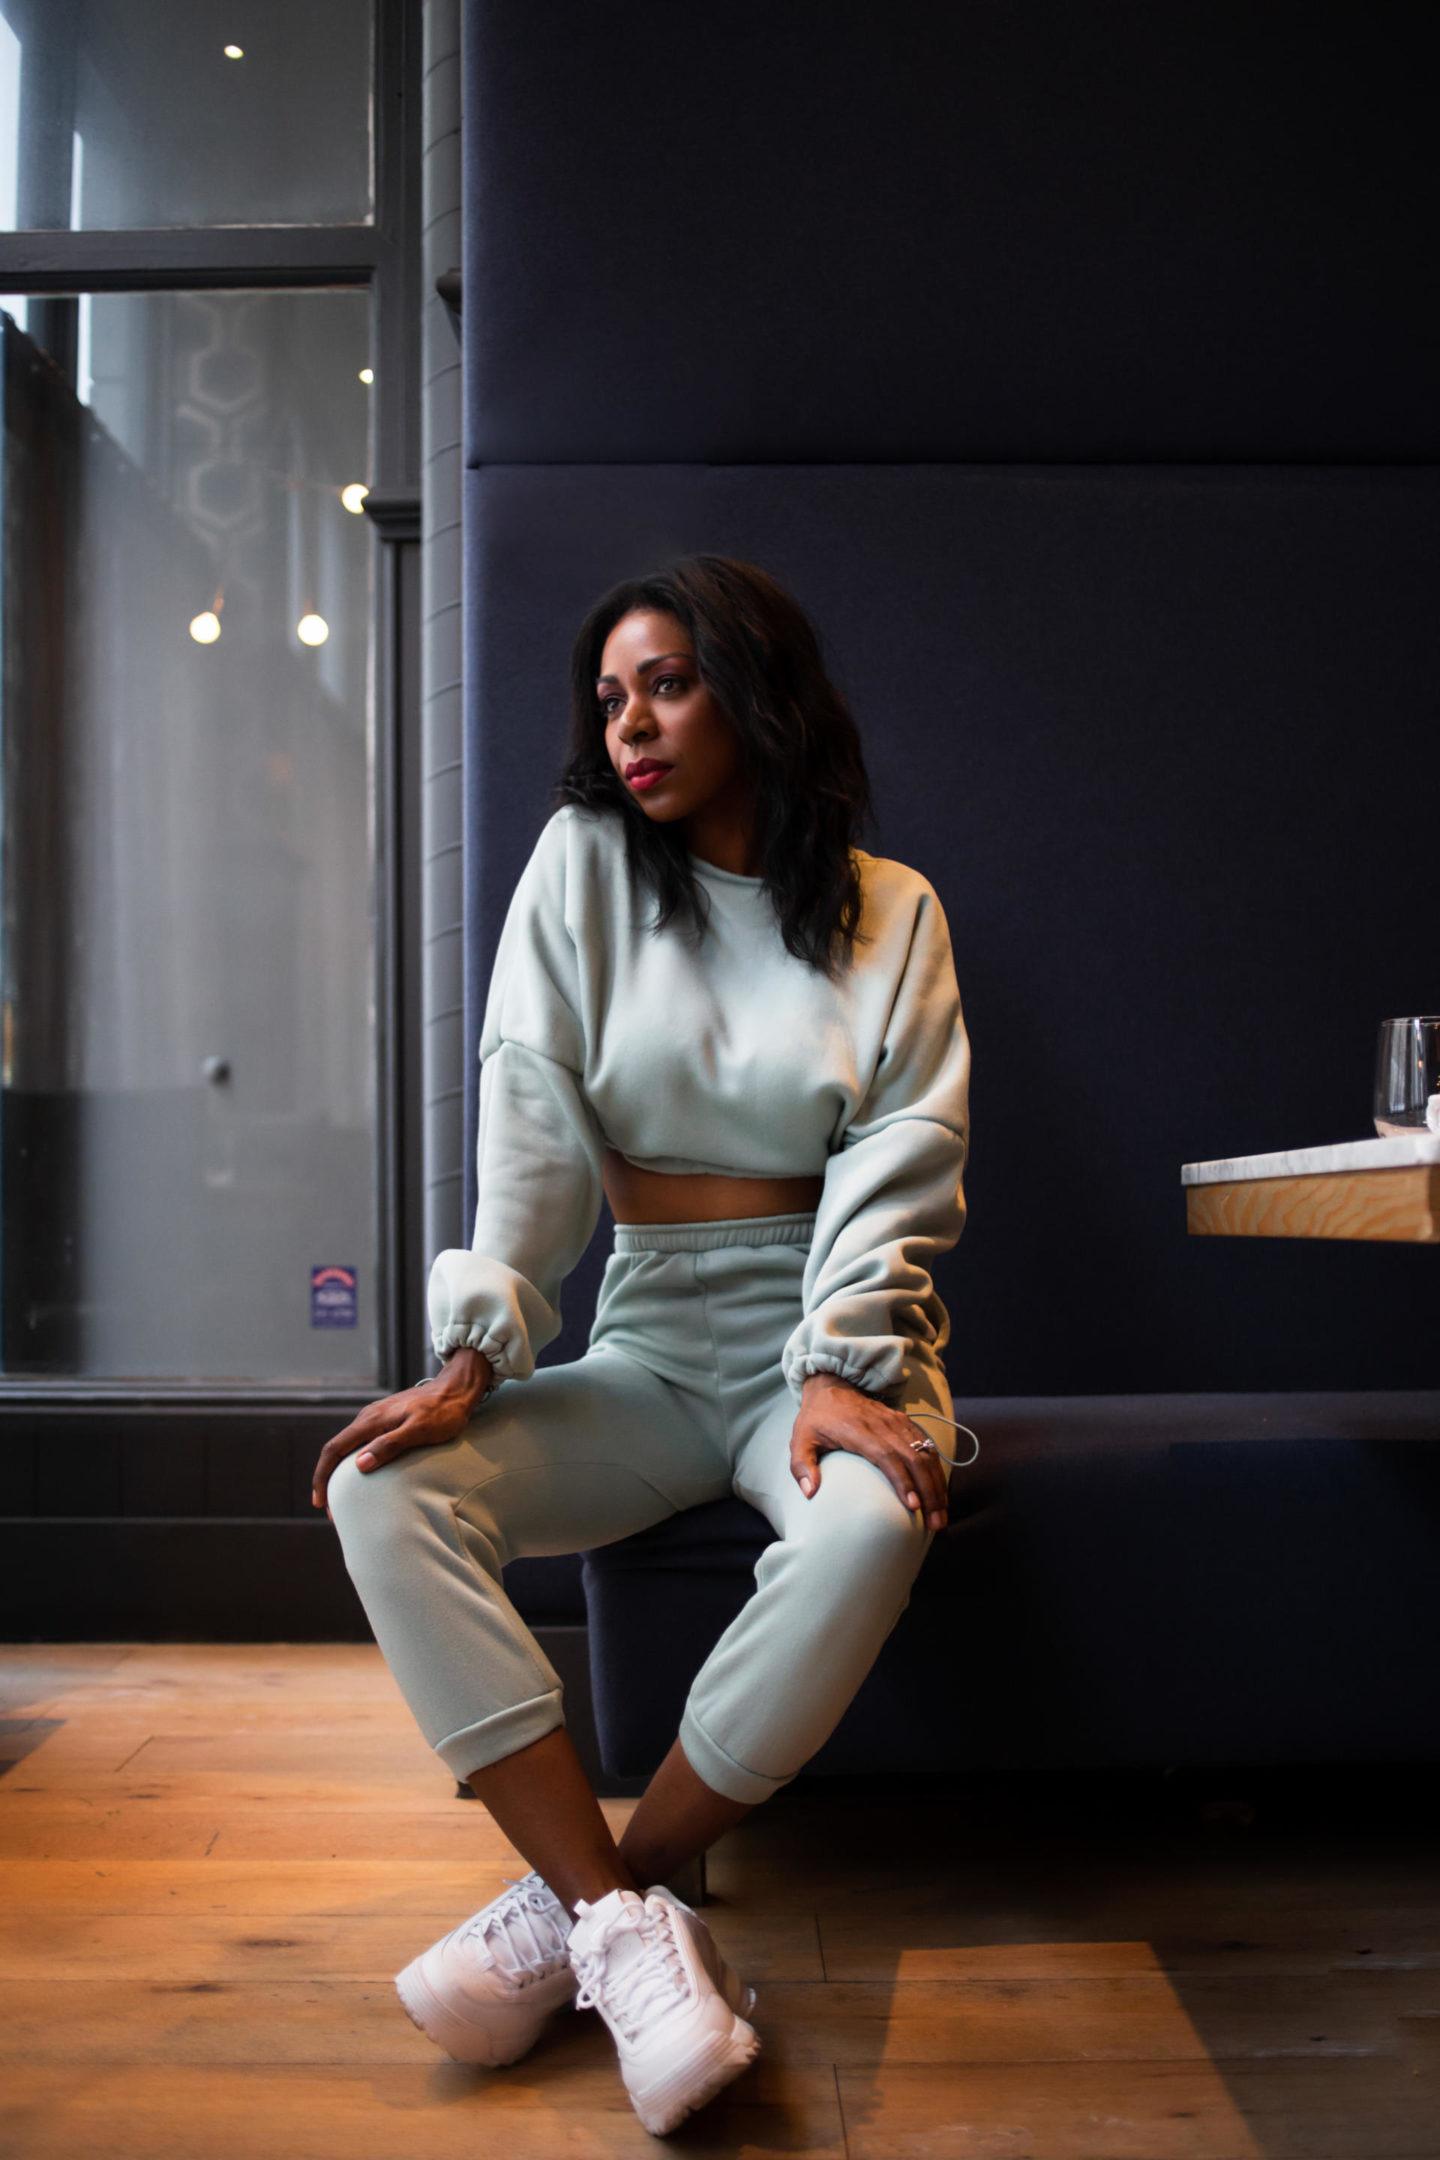 Dominique Baker sitting at Social Restaurant and Bar